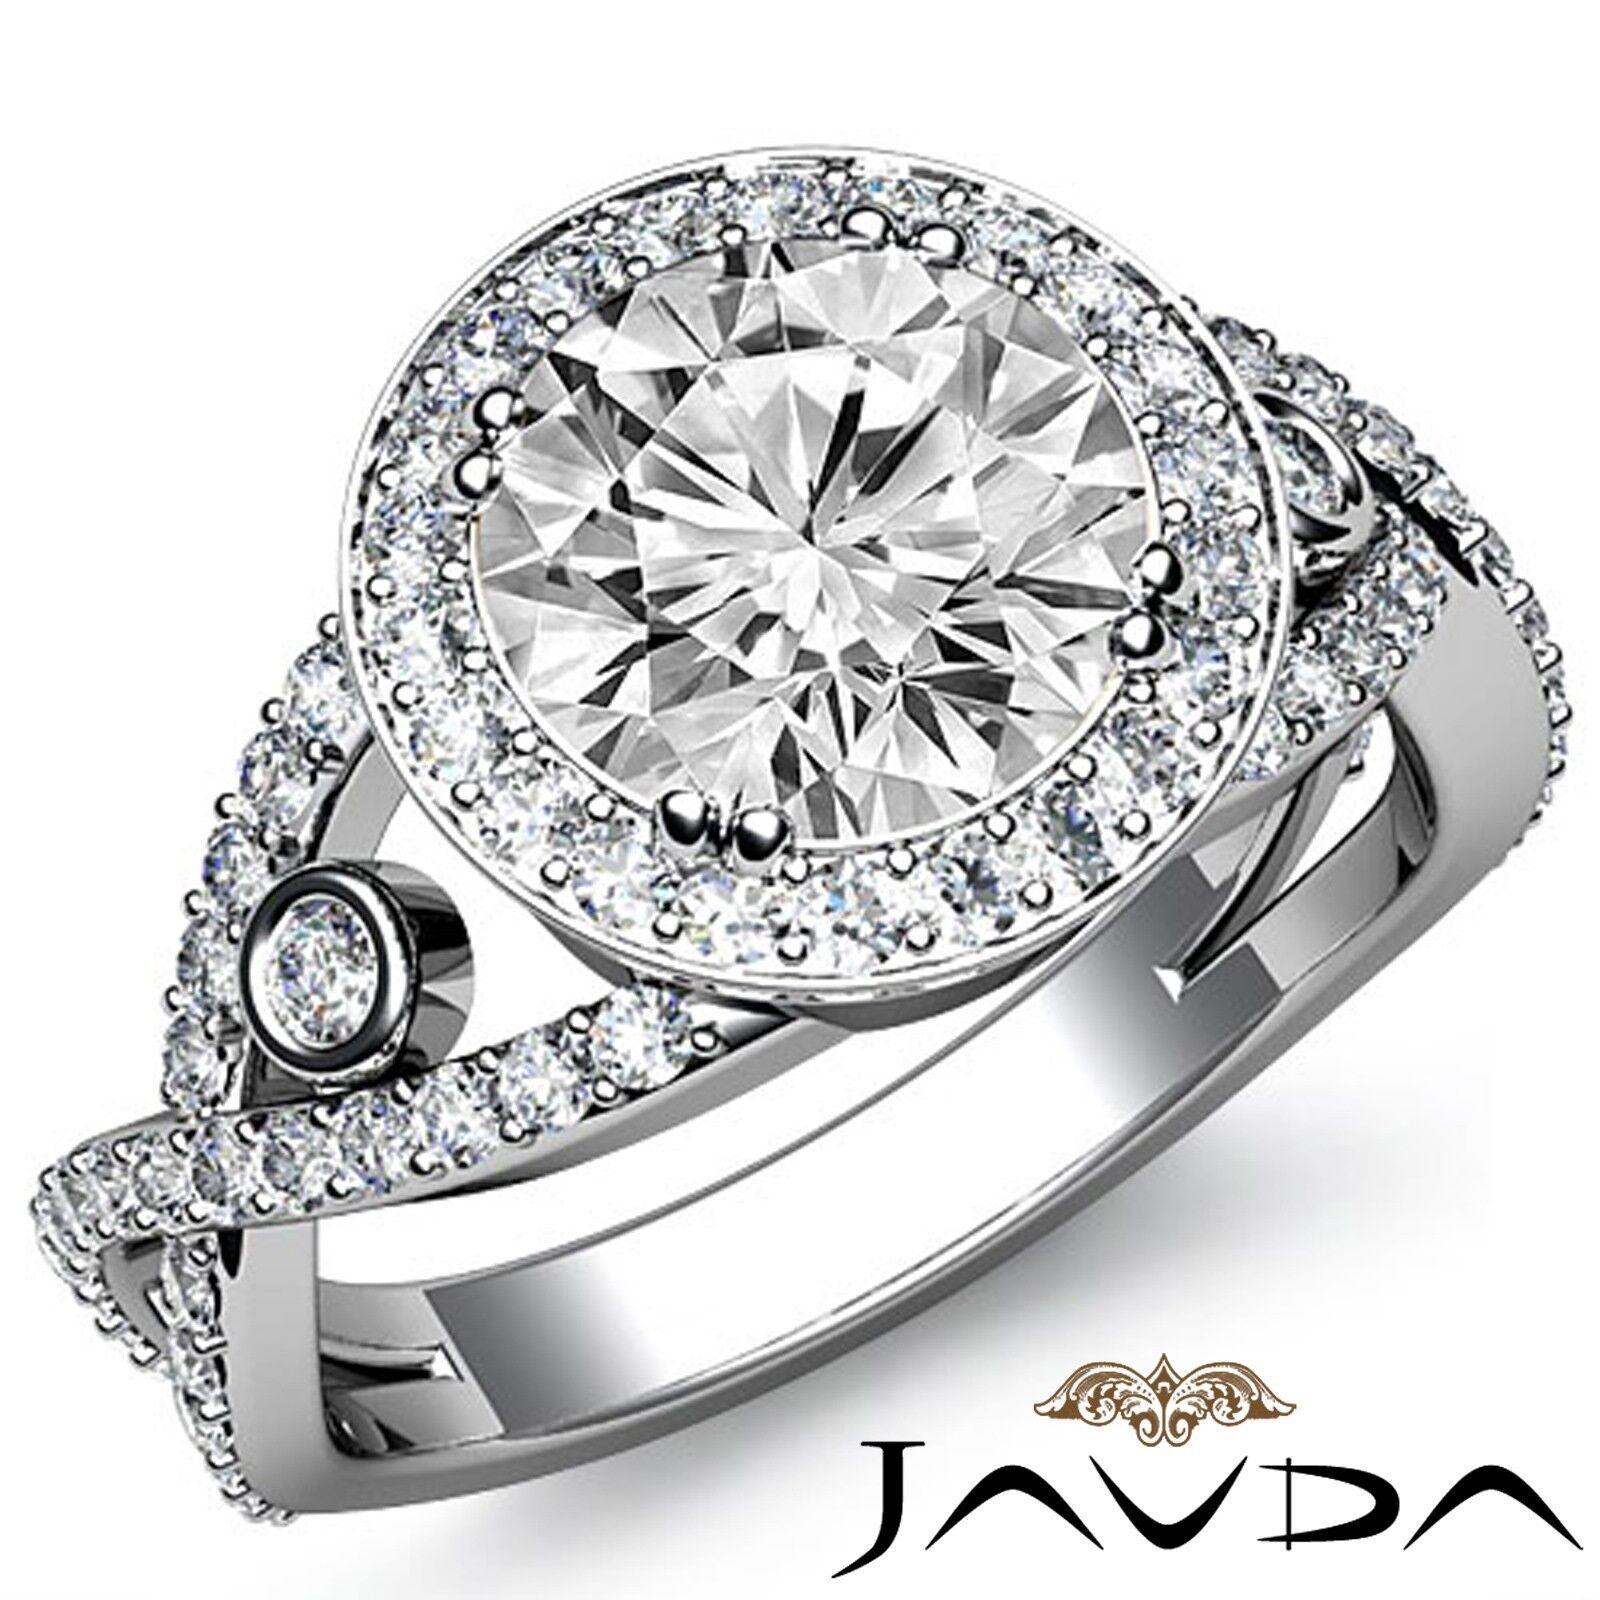 3.45ct Cross Shank Bezel Halo Round Diamond Engagement Ring GIA E-SI1 White Gold